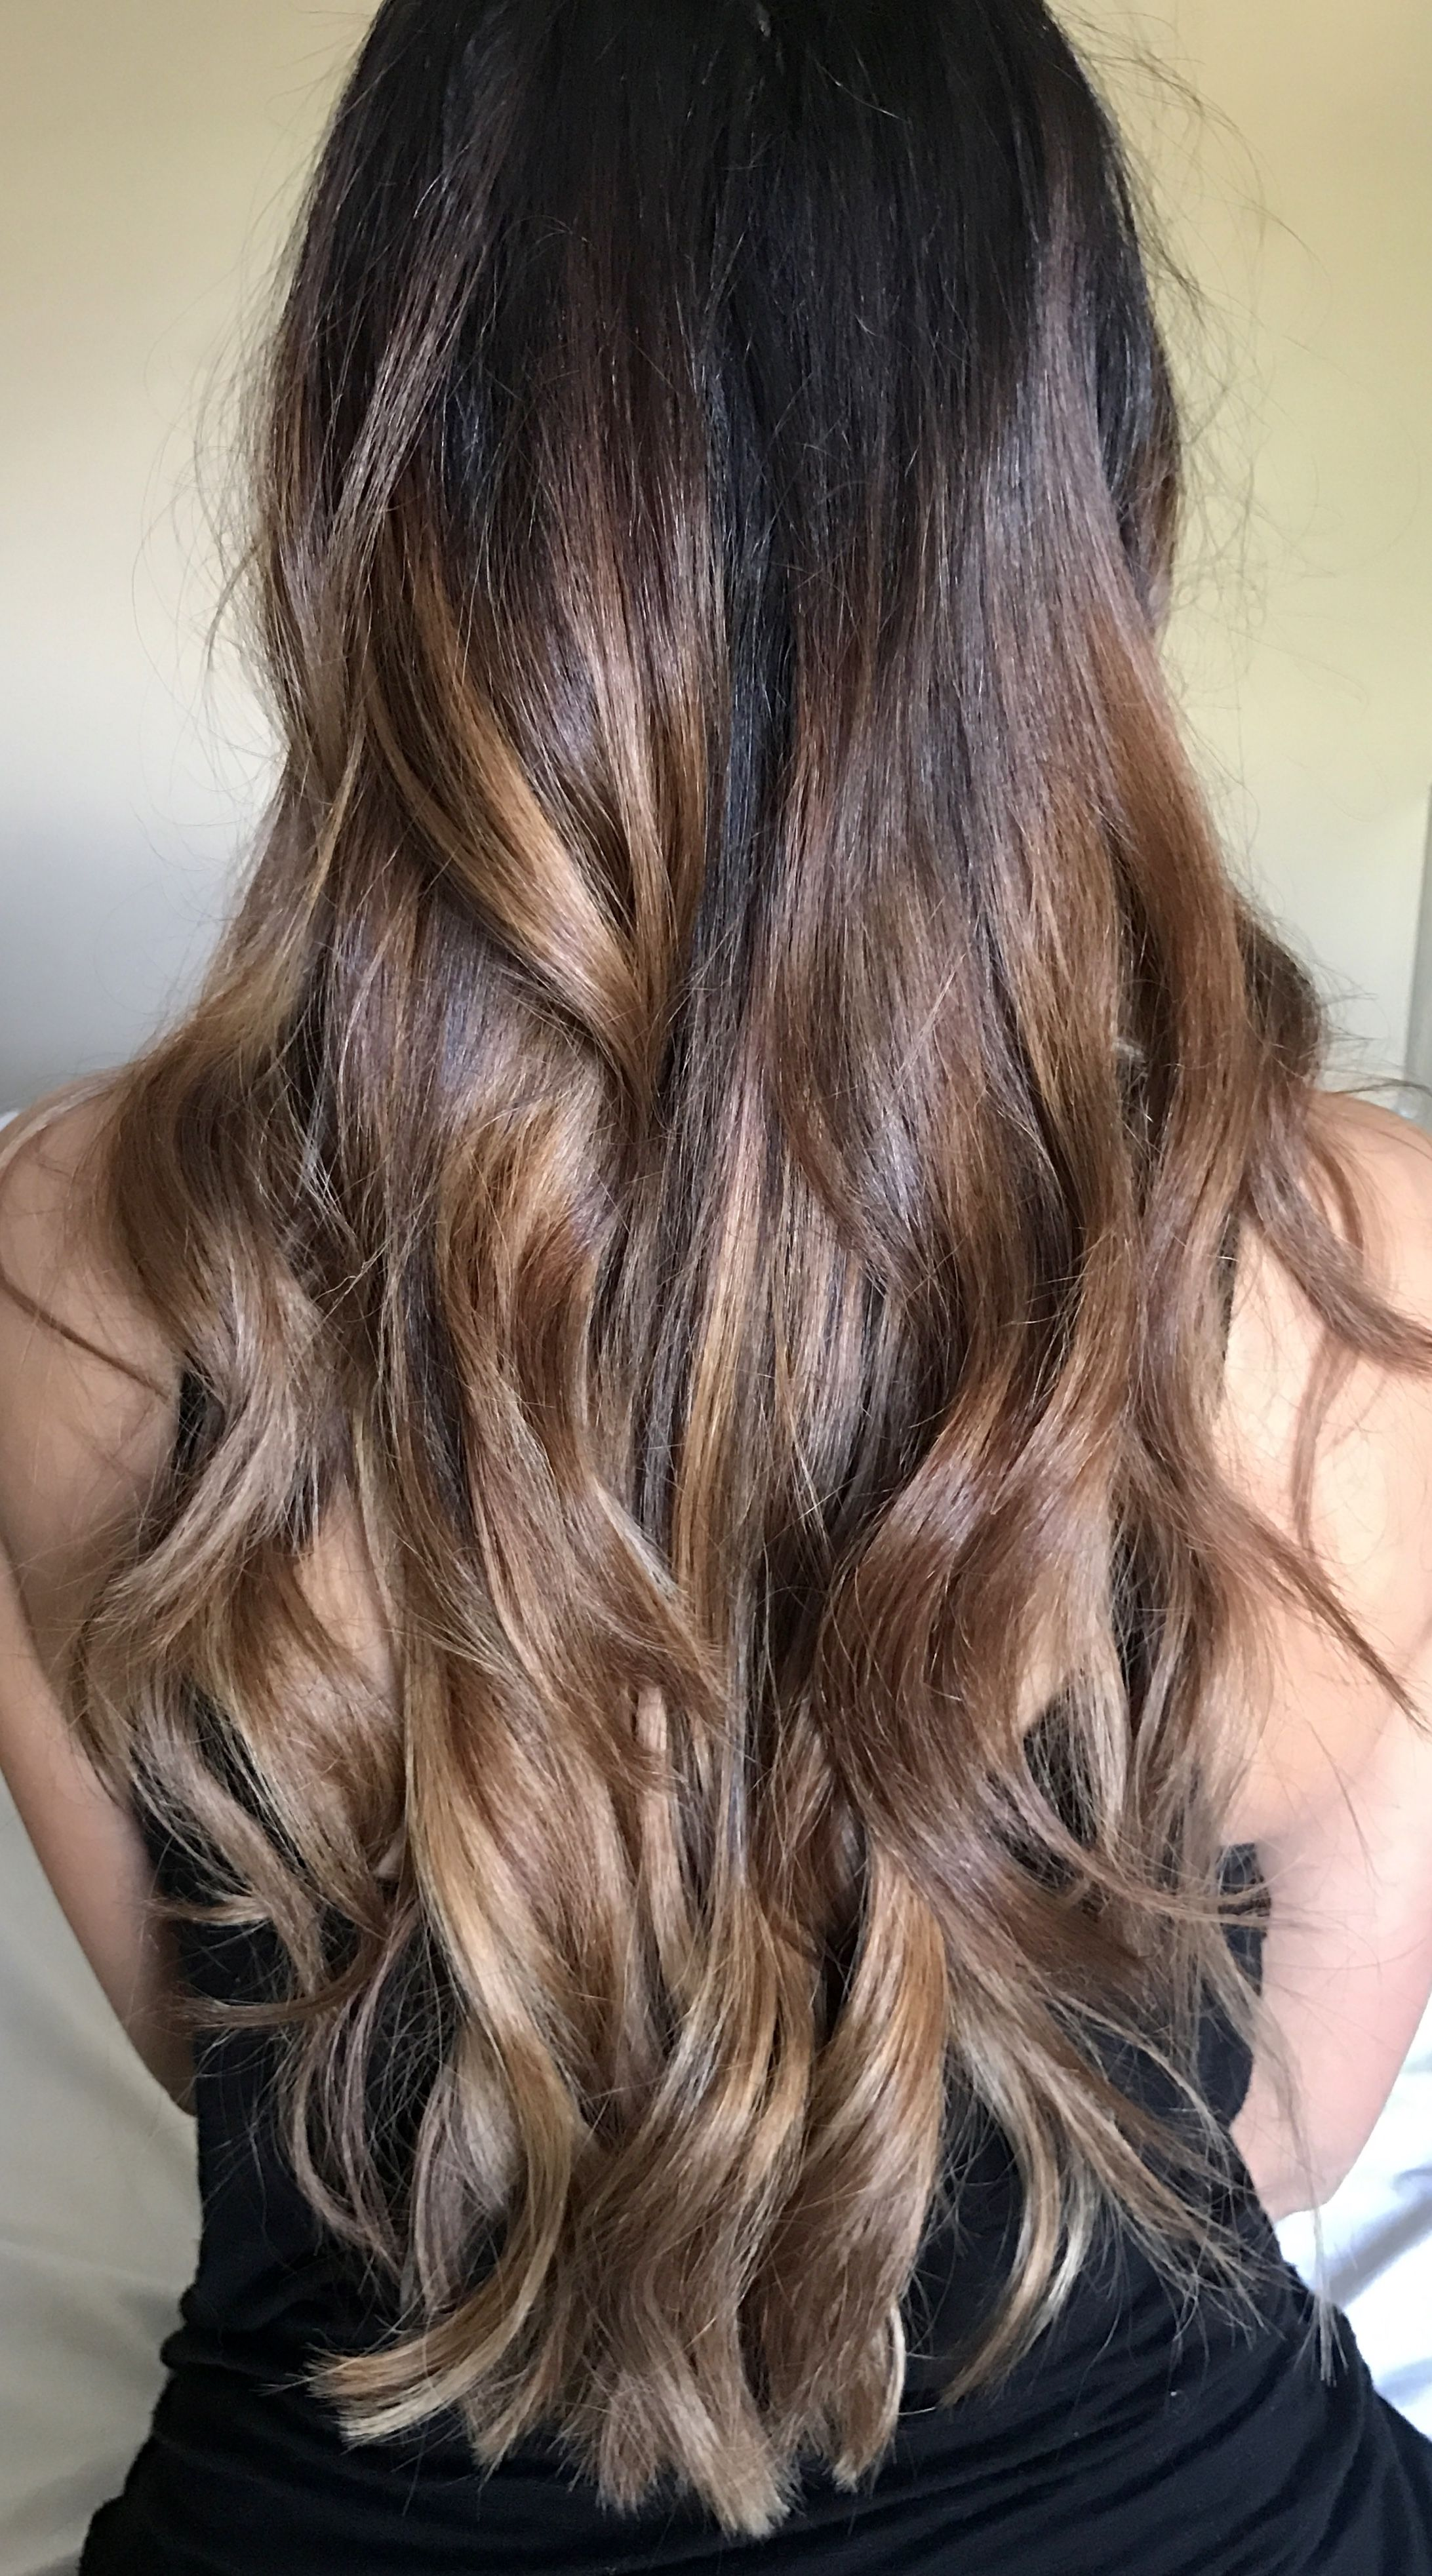 Ash Brown Blonde Ombre Wella Toner T18 Pale Ash Blonde Brown To Blonde Brown To Blonde Ombre Balayage Hair Blonde Long